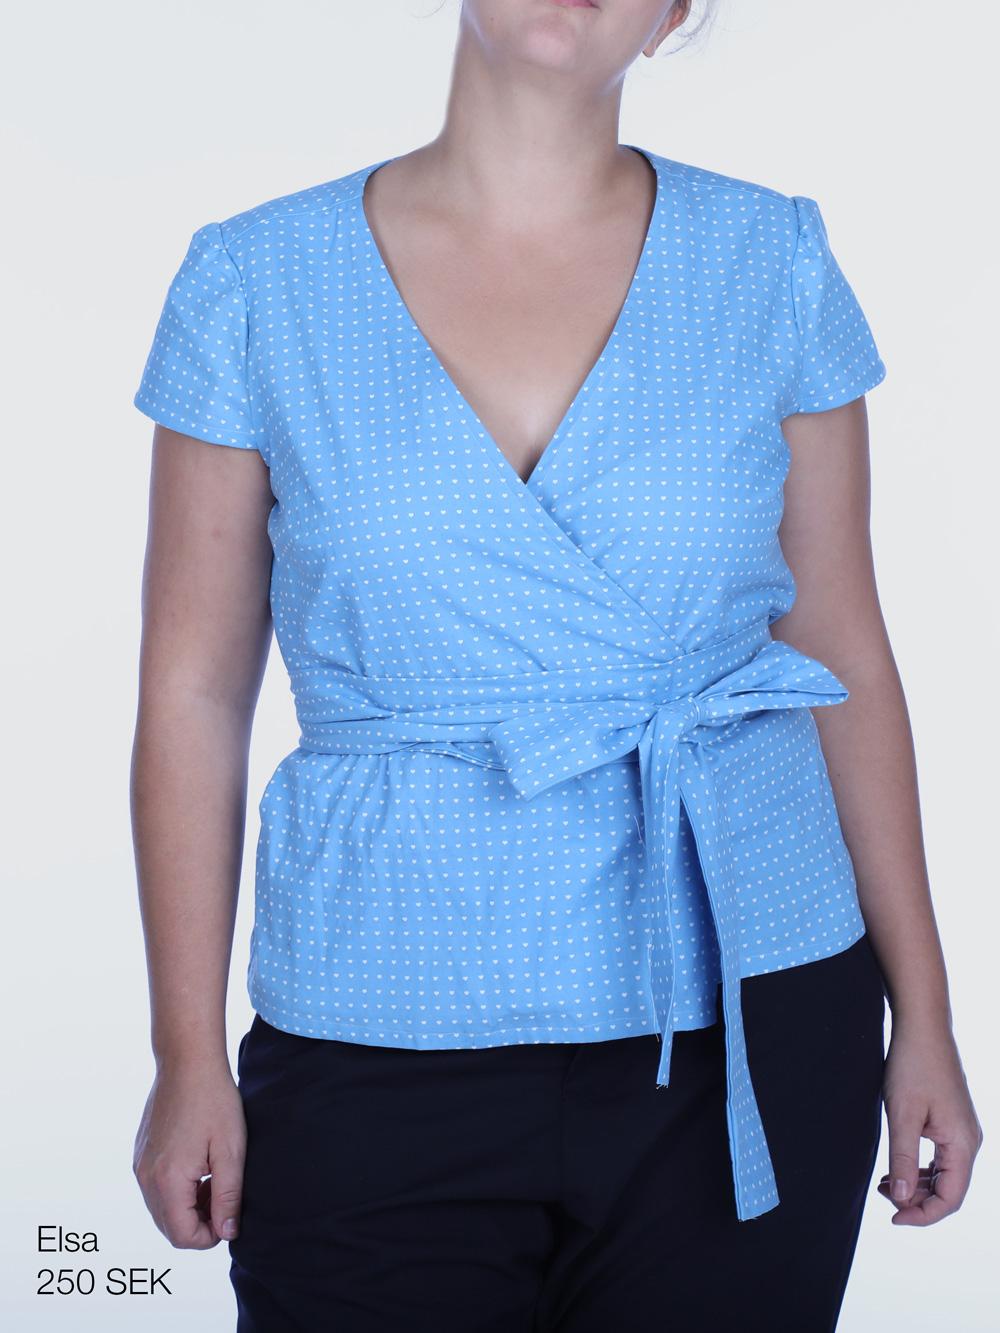 sewing_pattern_mf_elsa3g